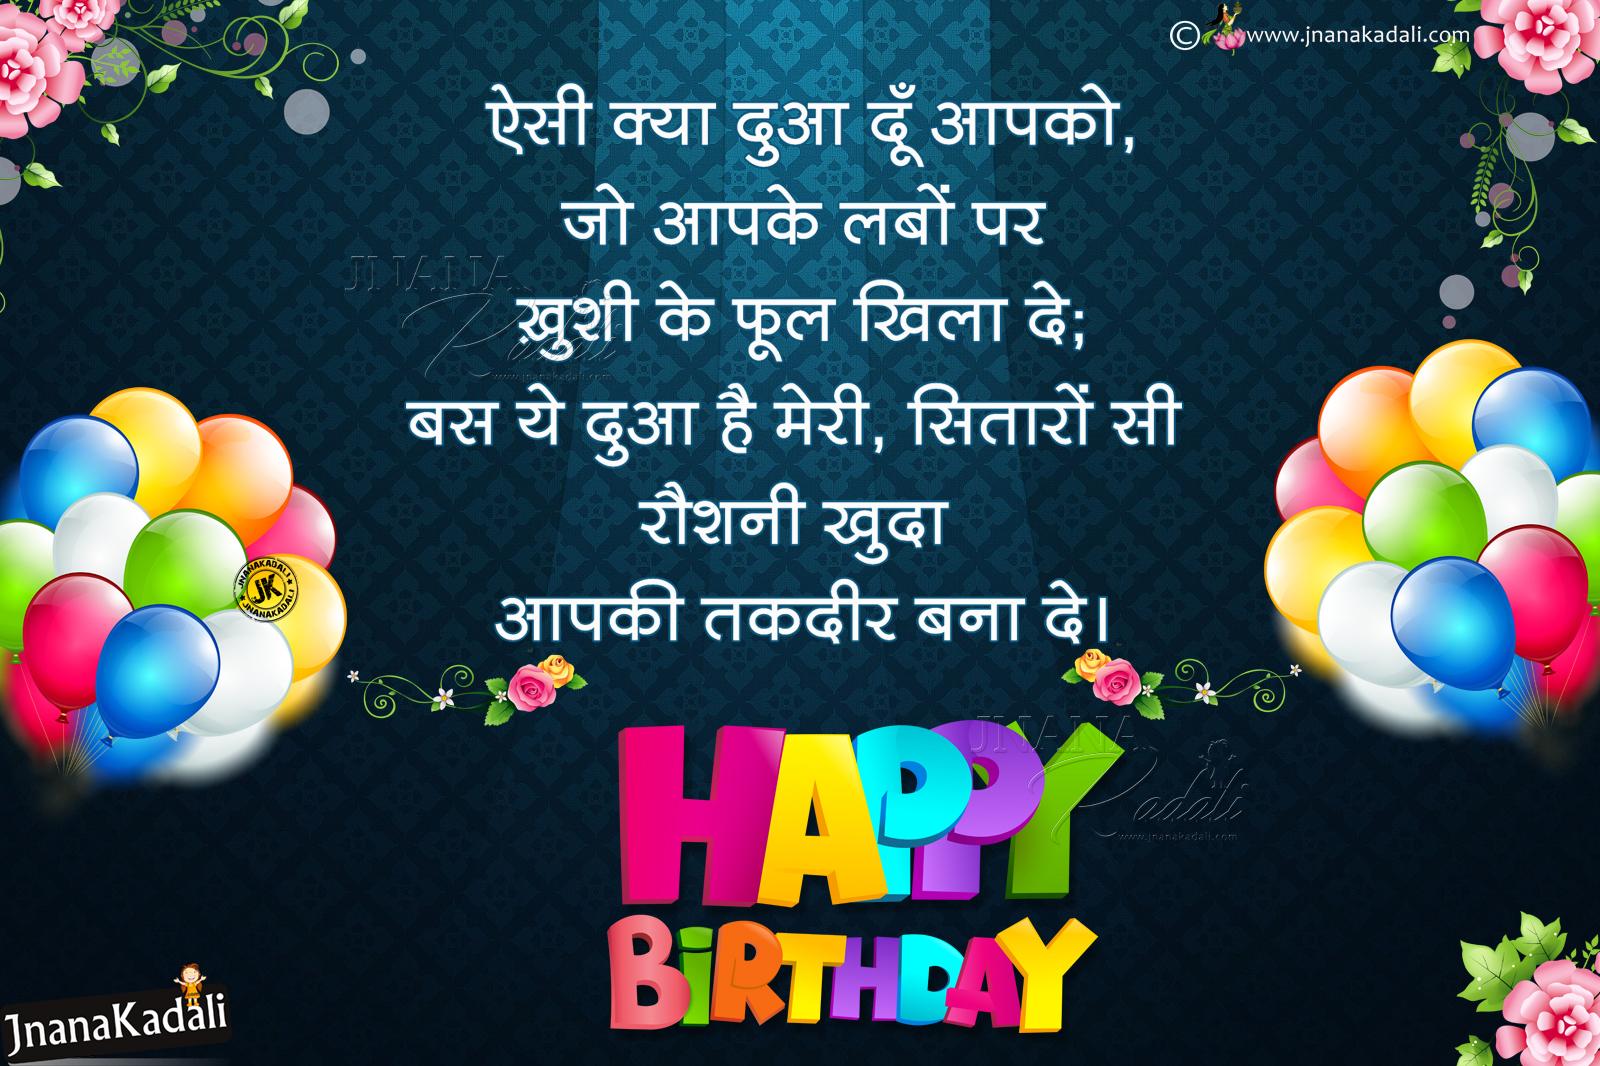 Best Hindi Birthday Greetings For Friend Happy Birthday Shayari In